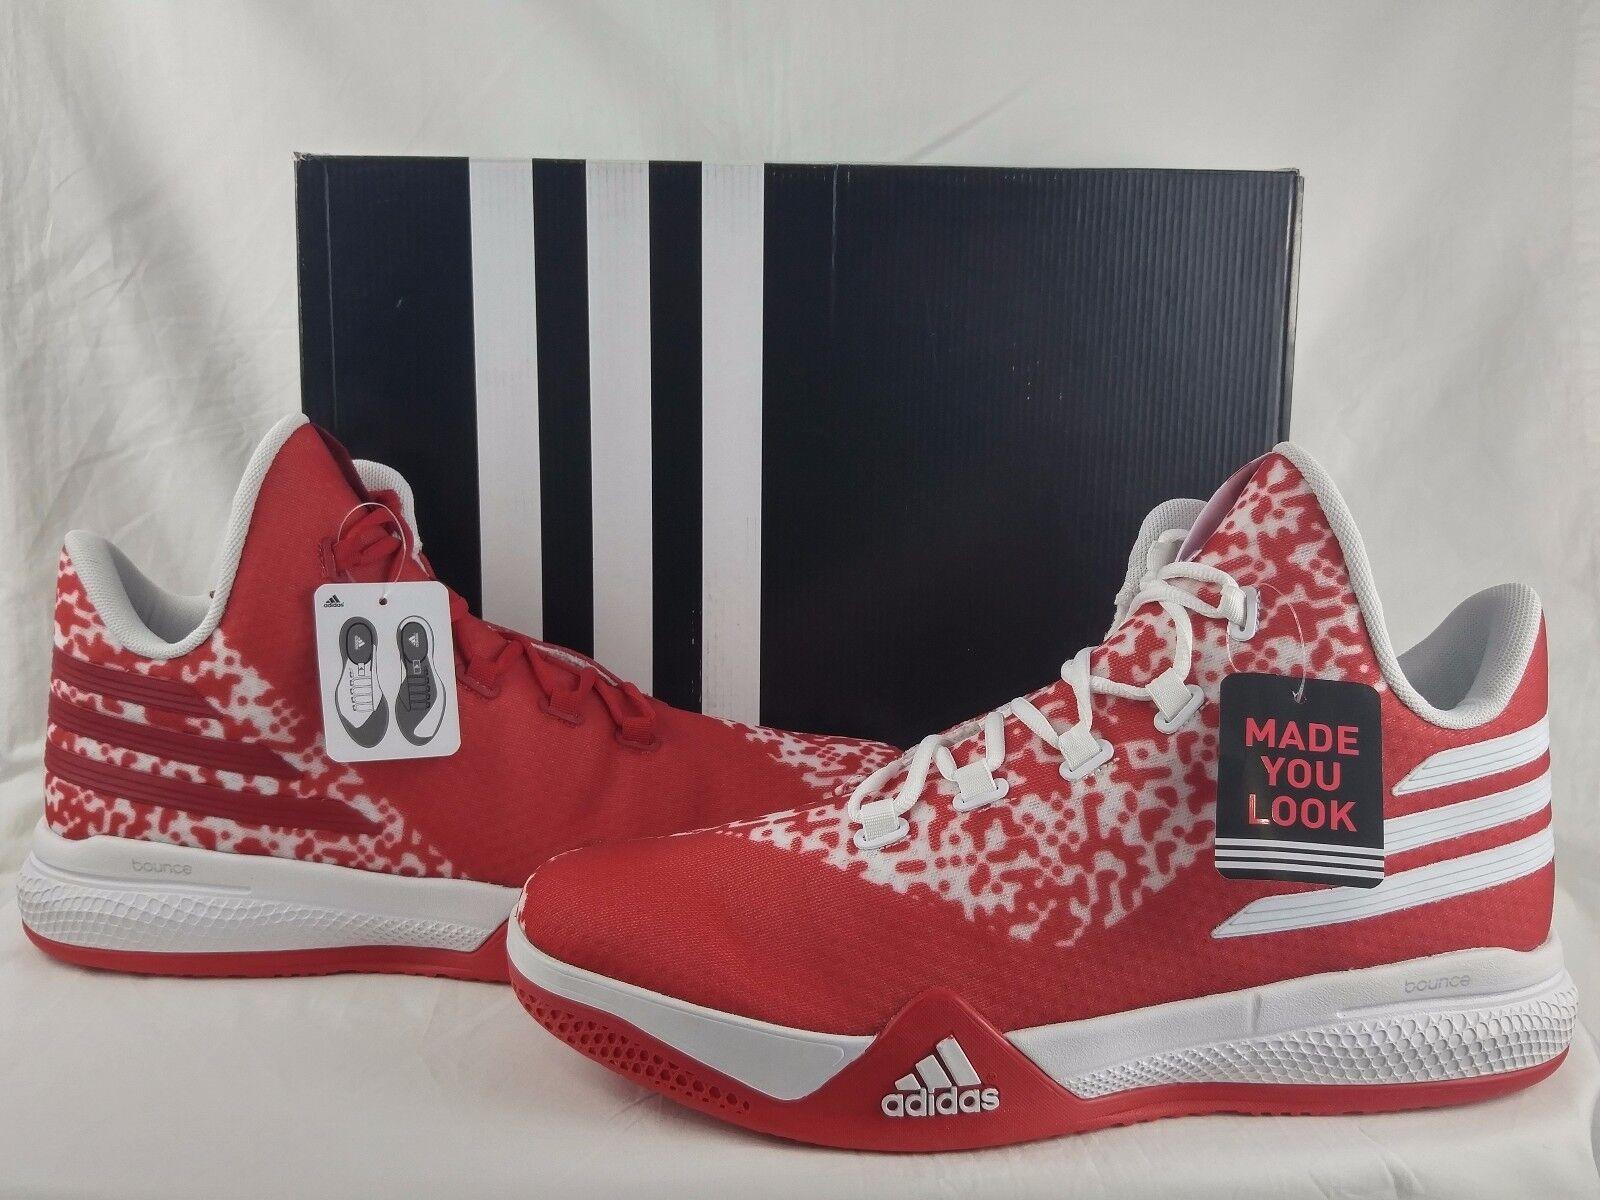 Adidas SM On Court Light Em Up 2 Basketball shoes Men's Size 14.5 17 AQ8053 Red